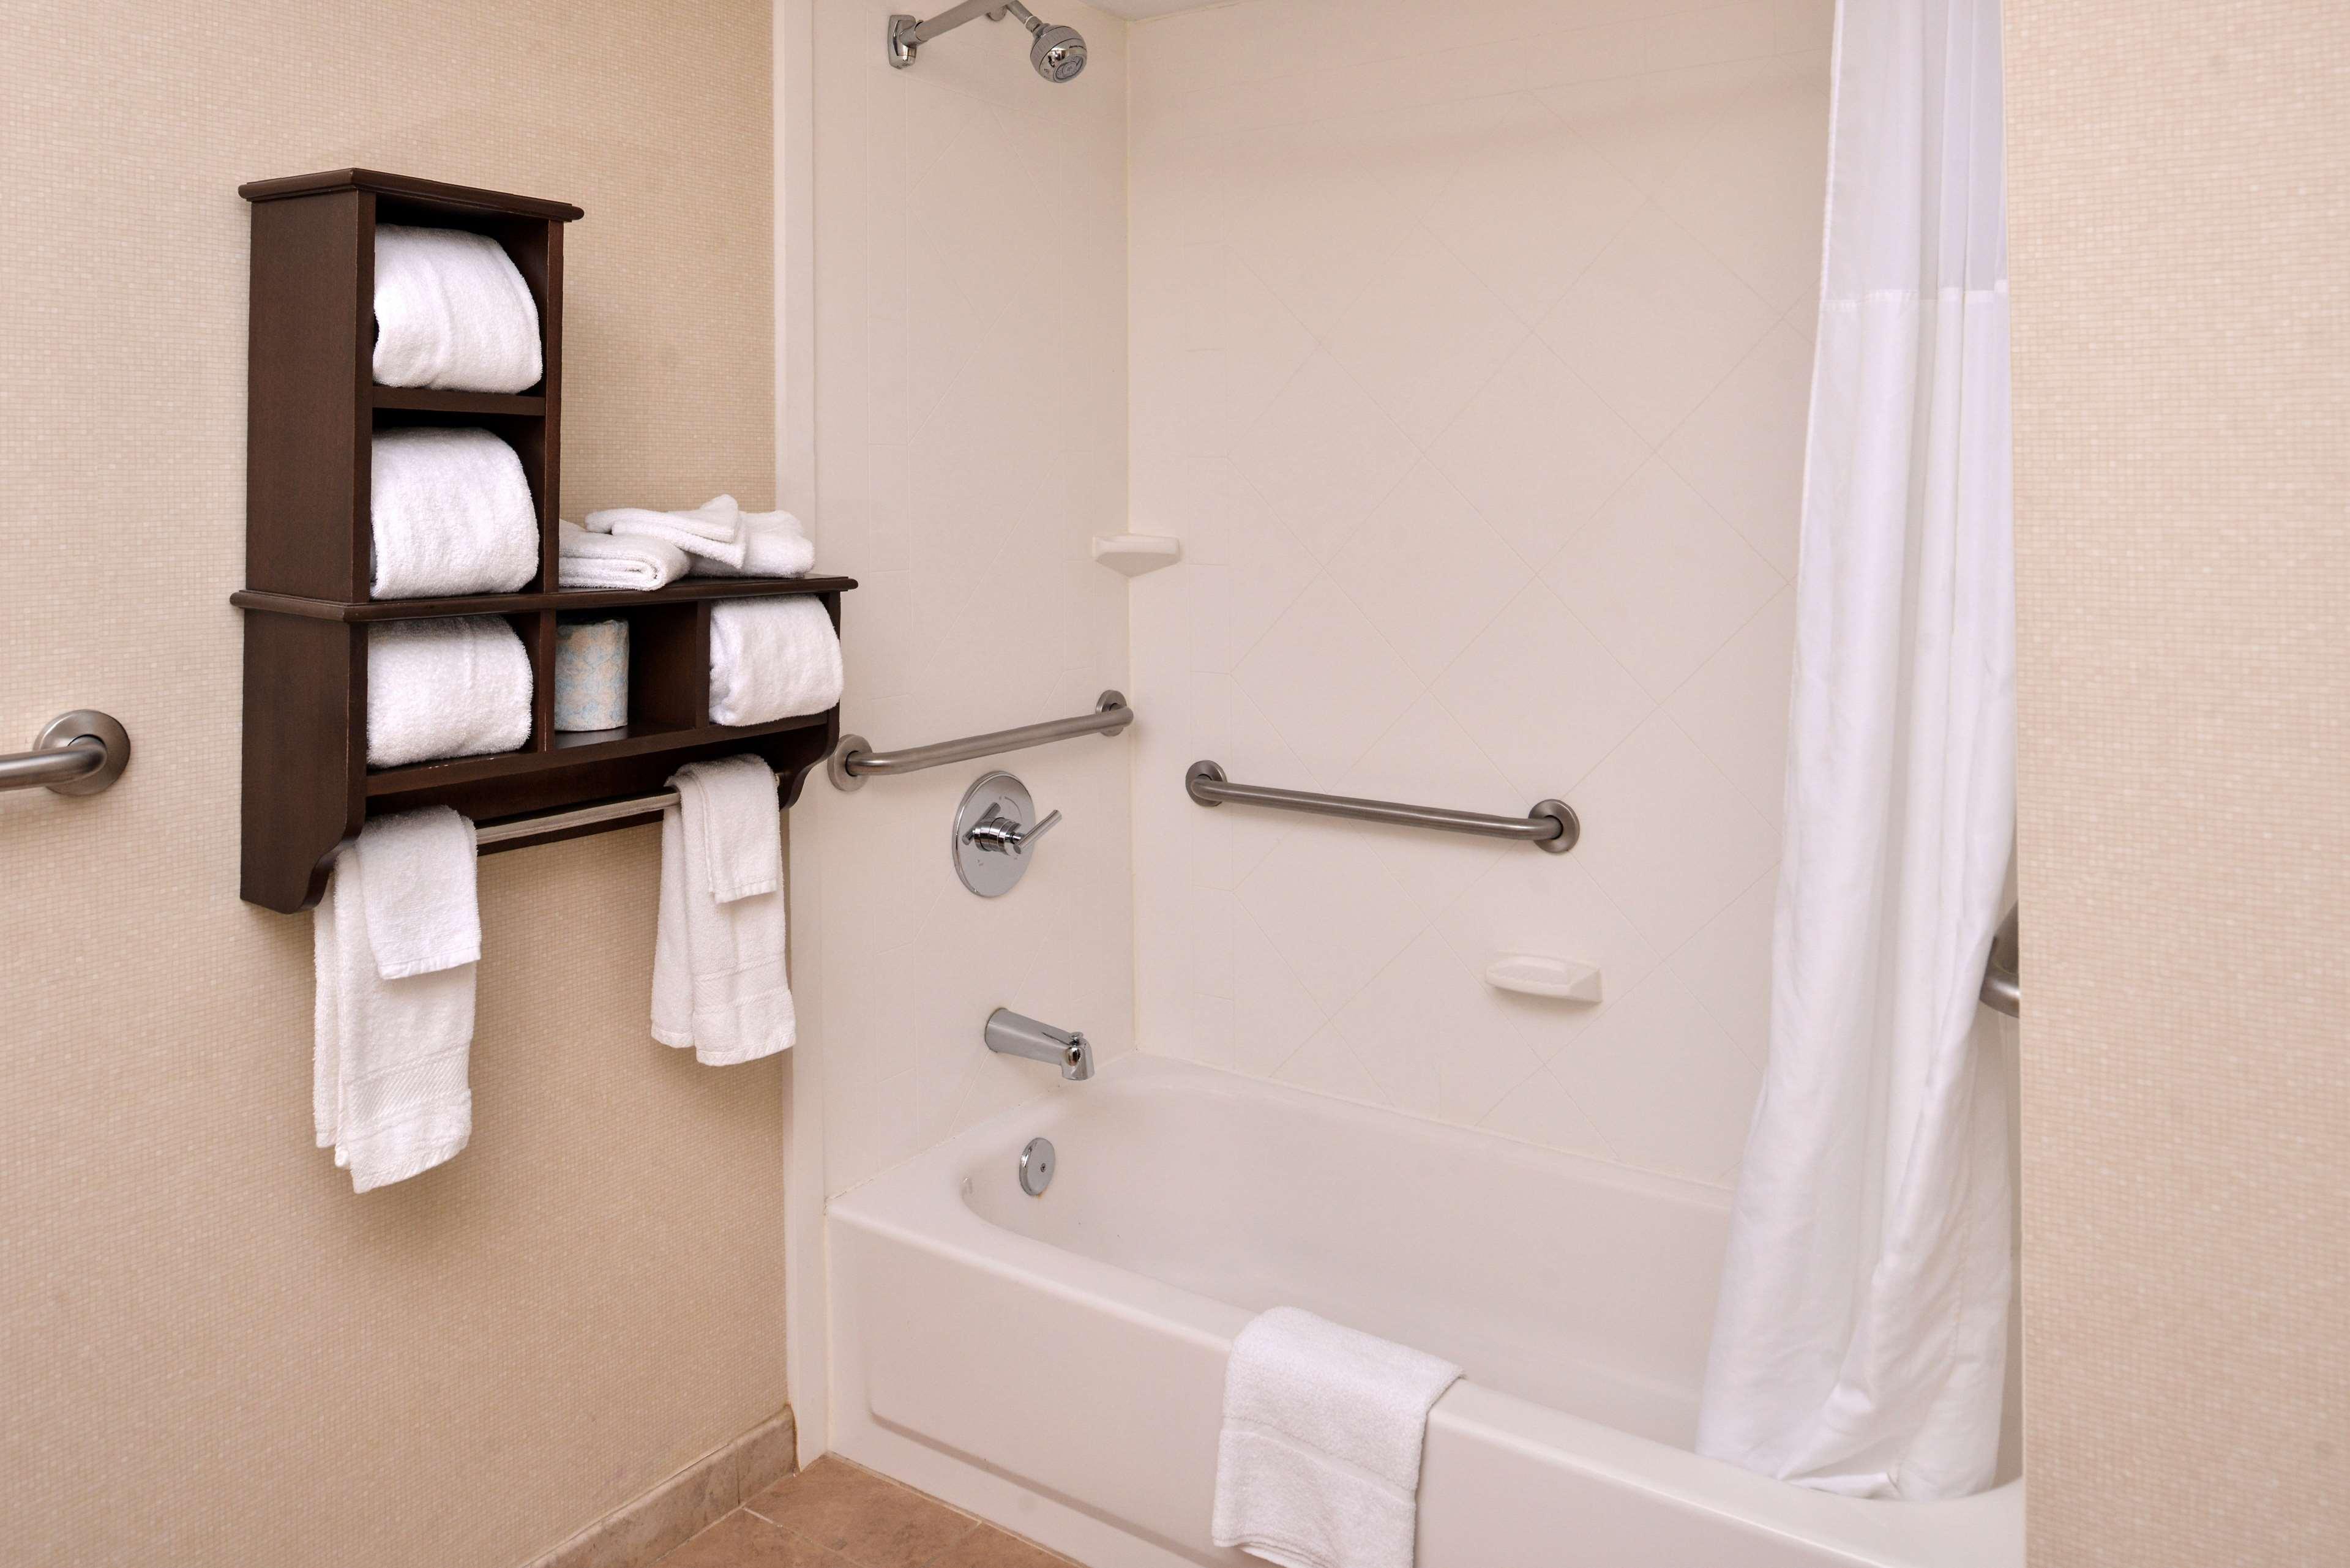 Hampton Inn & Suites Newport News (Oyster Point) image 15